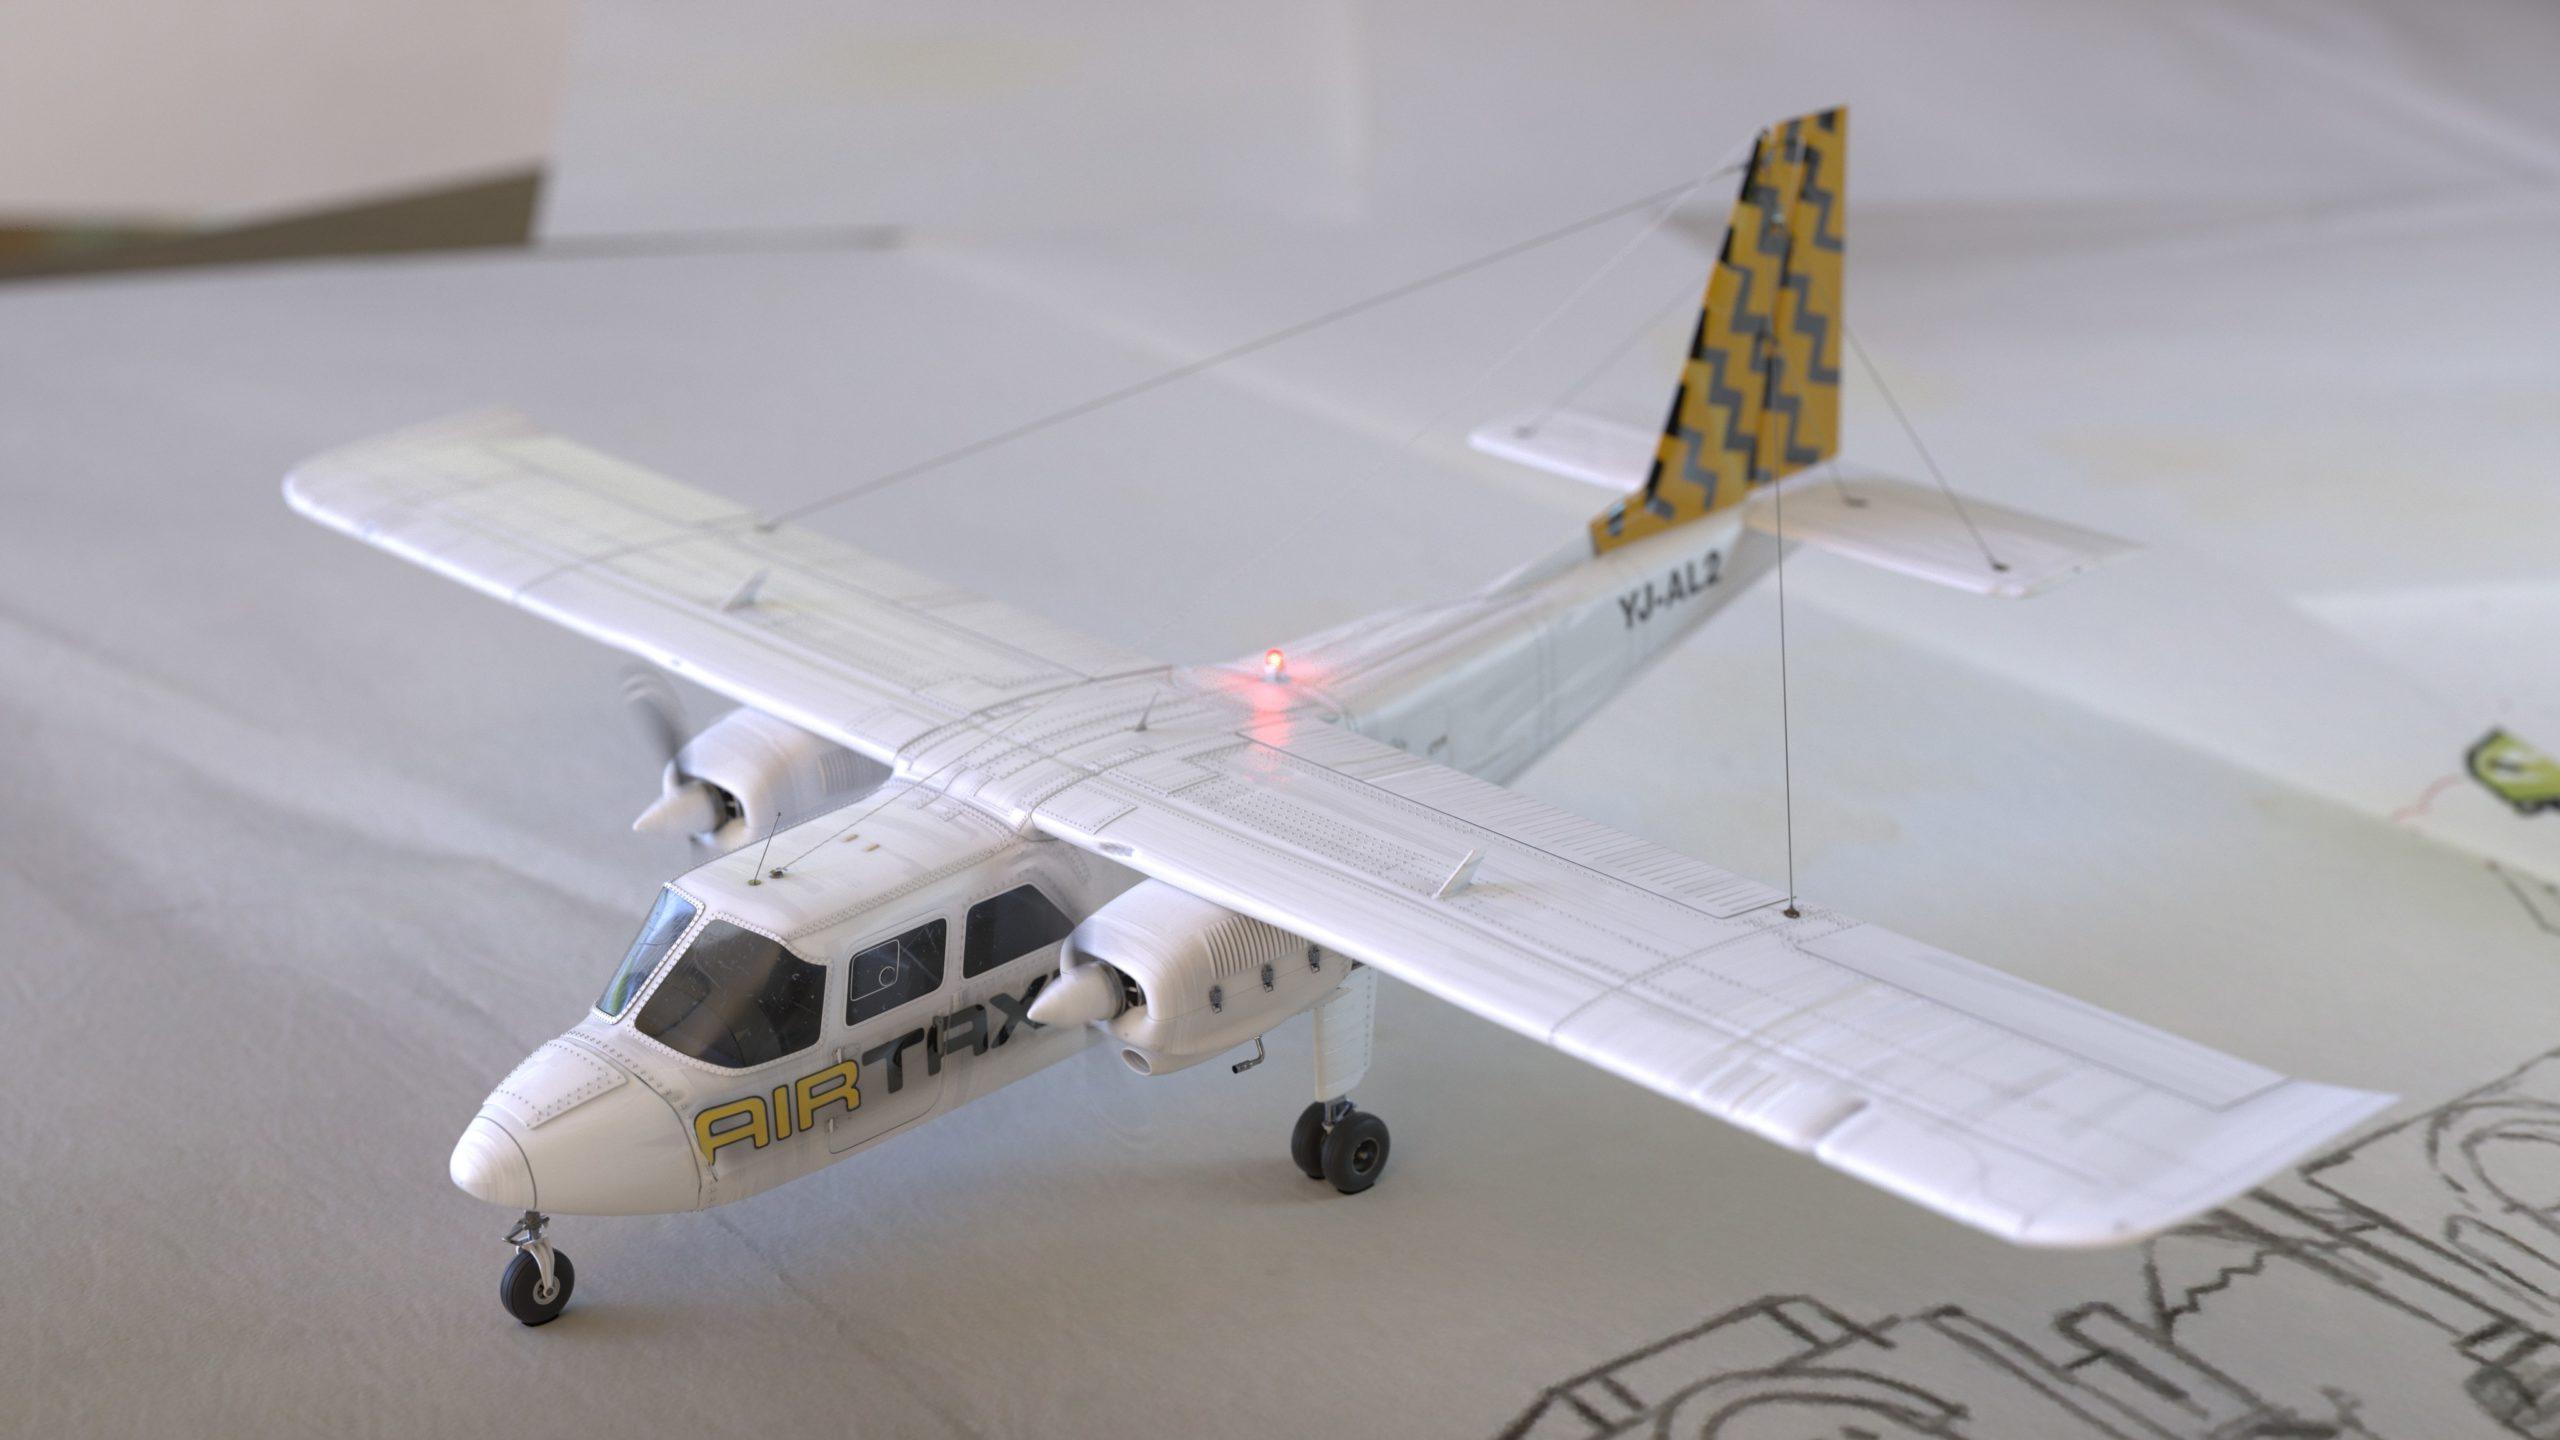 Flugzeug-047-TotaleOben0024